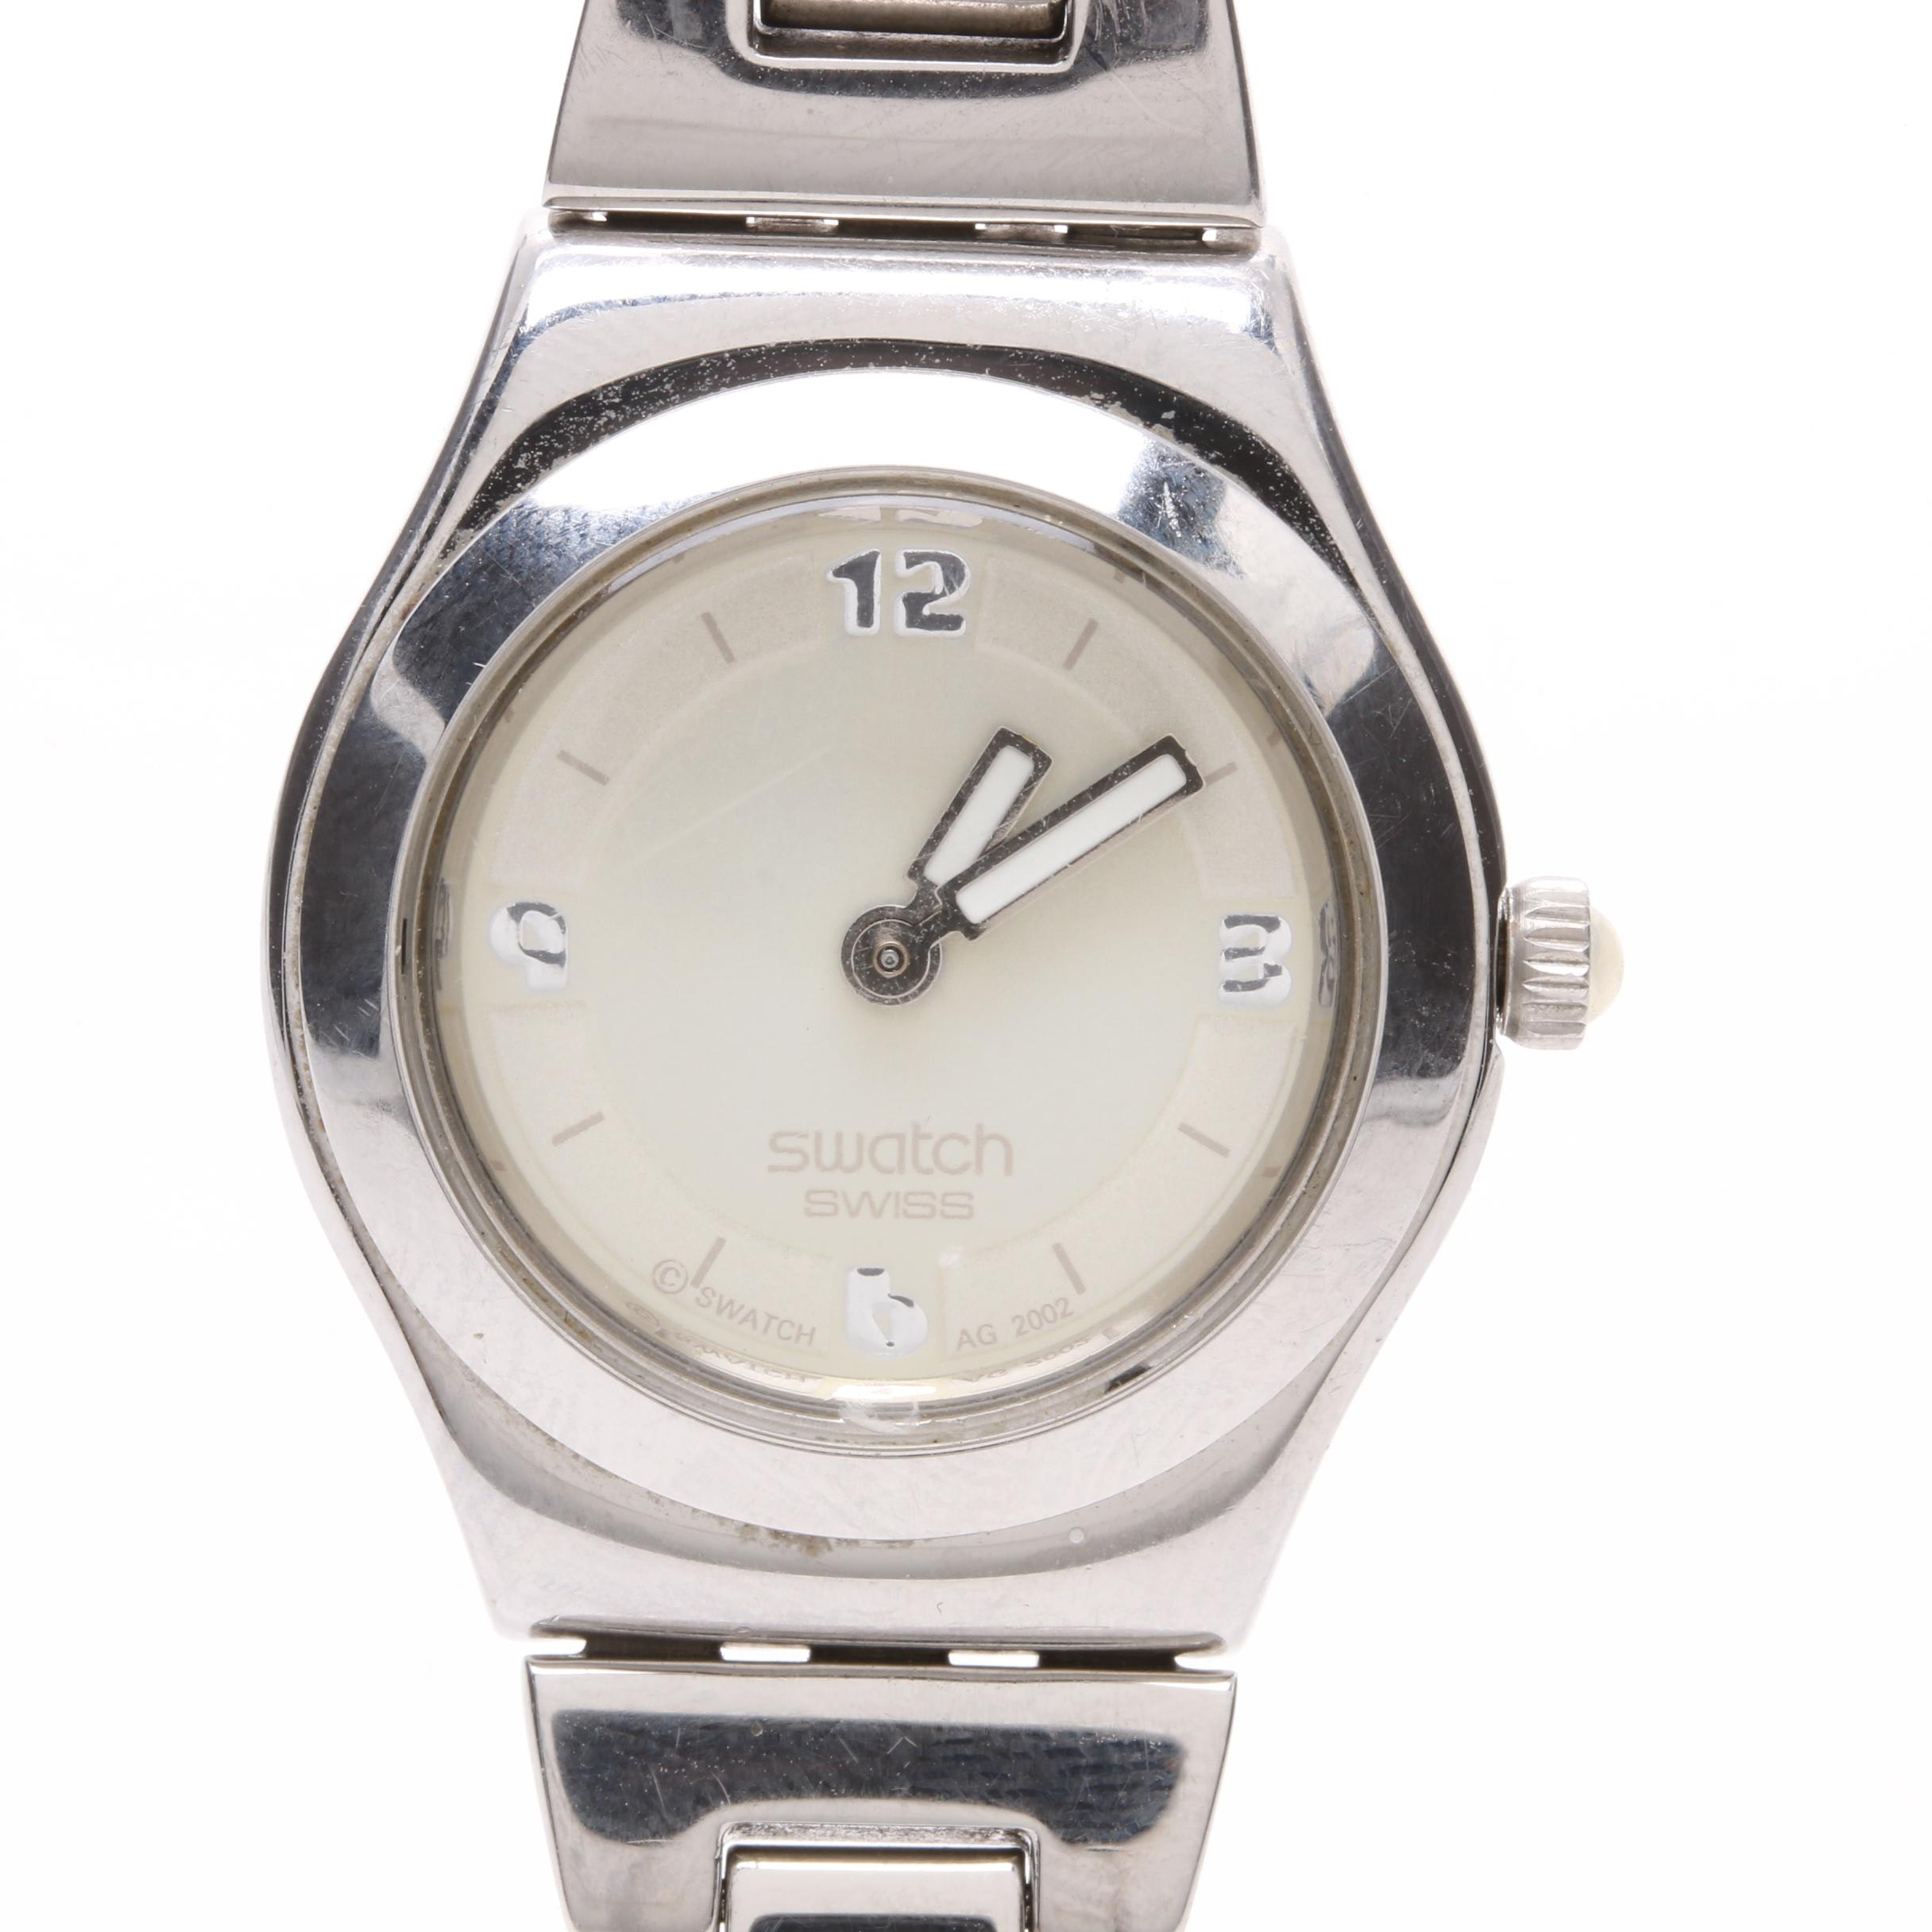 Swatch Stainless Steel Wristwatch